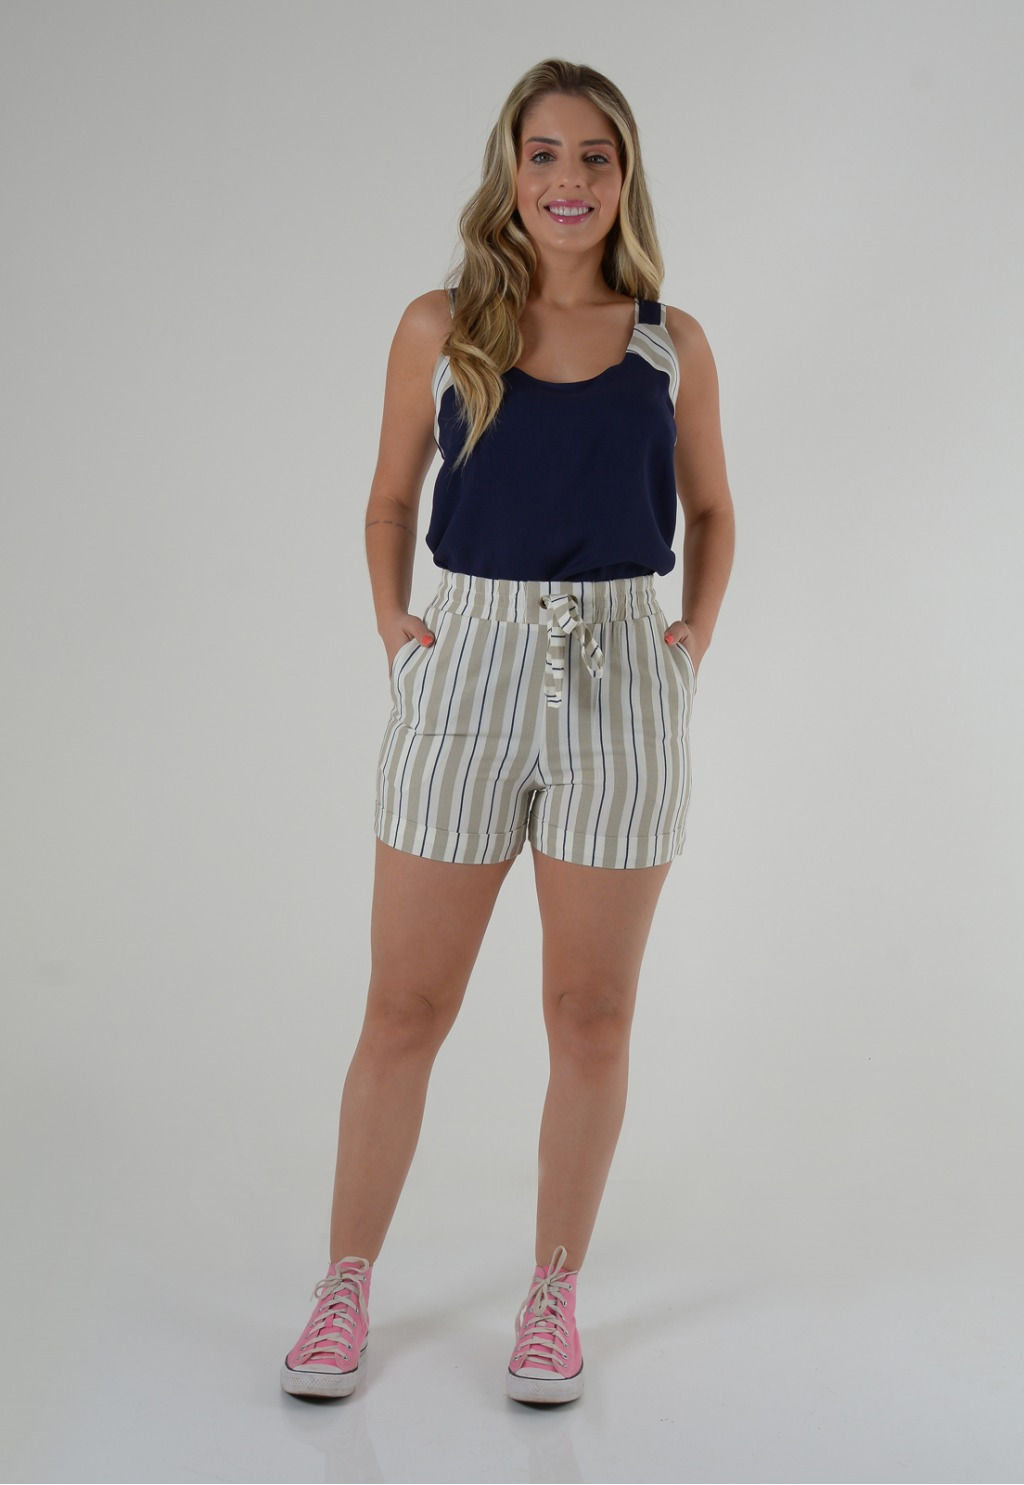 Conjunto Mamorena short listrado blusa cavada